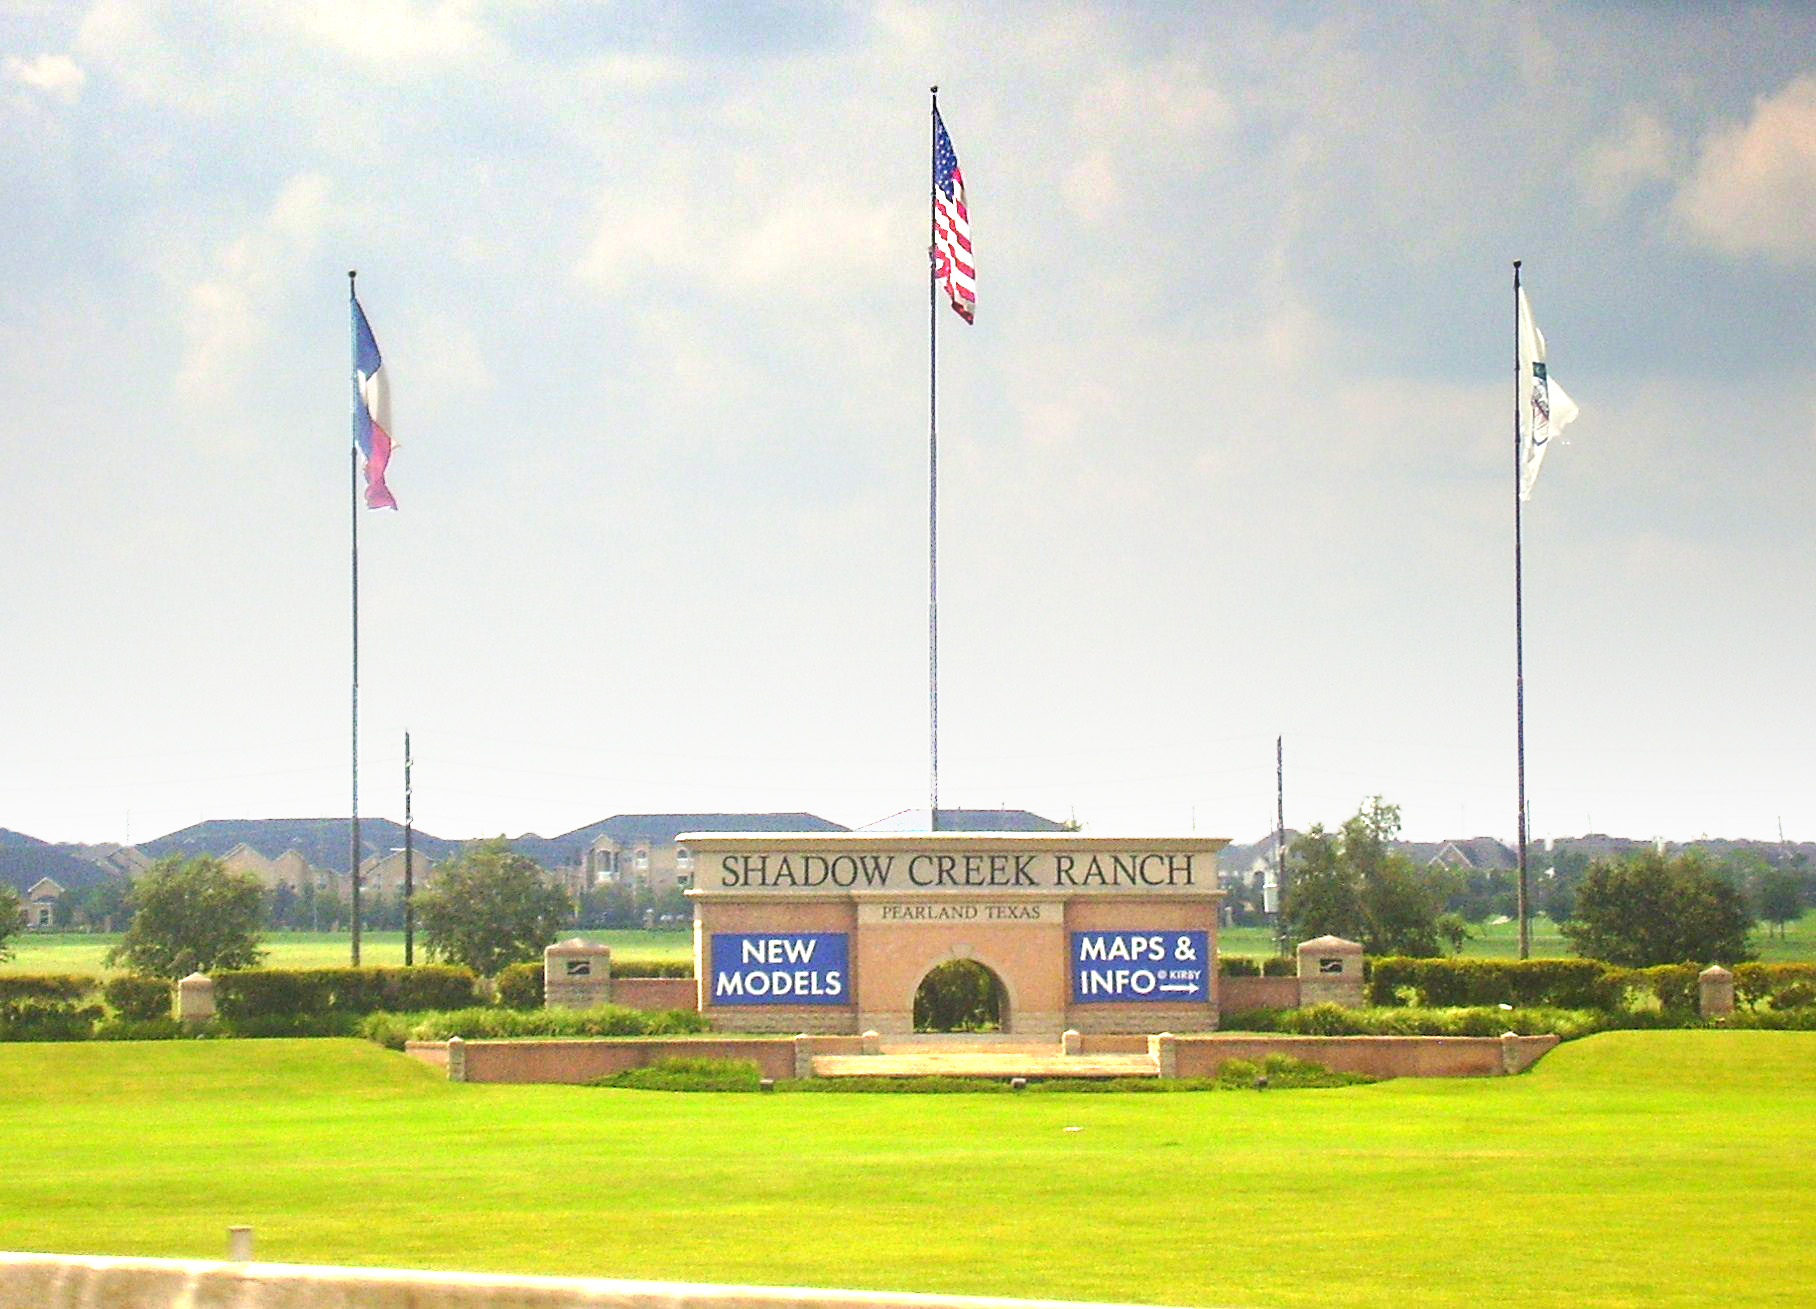 Shadow Creek Ranch Pearland,Texas <br><img src=